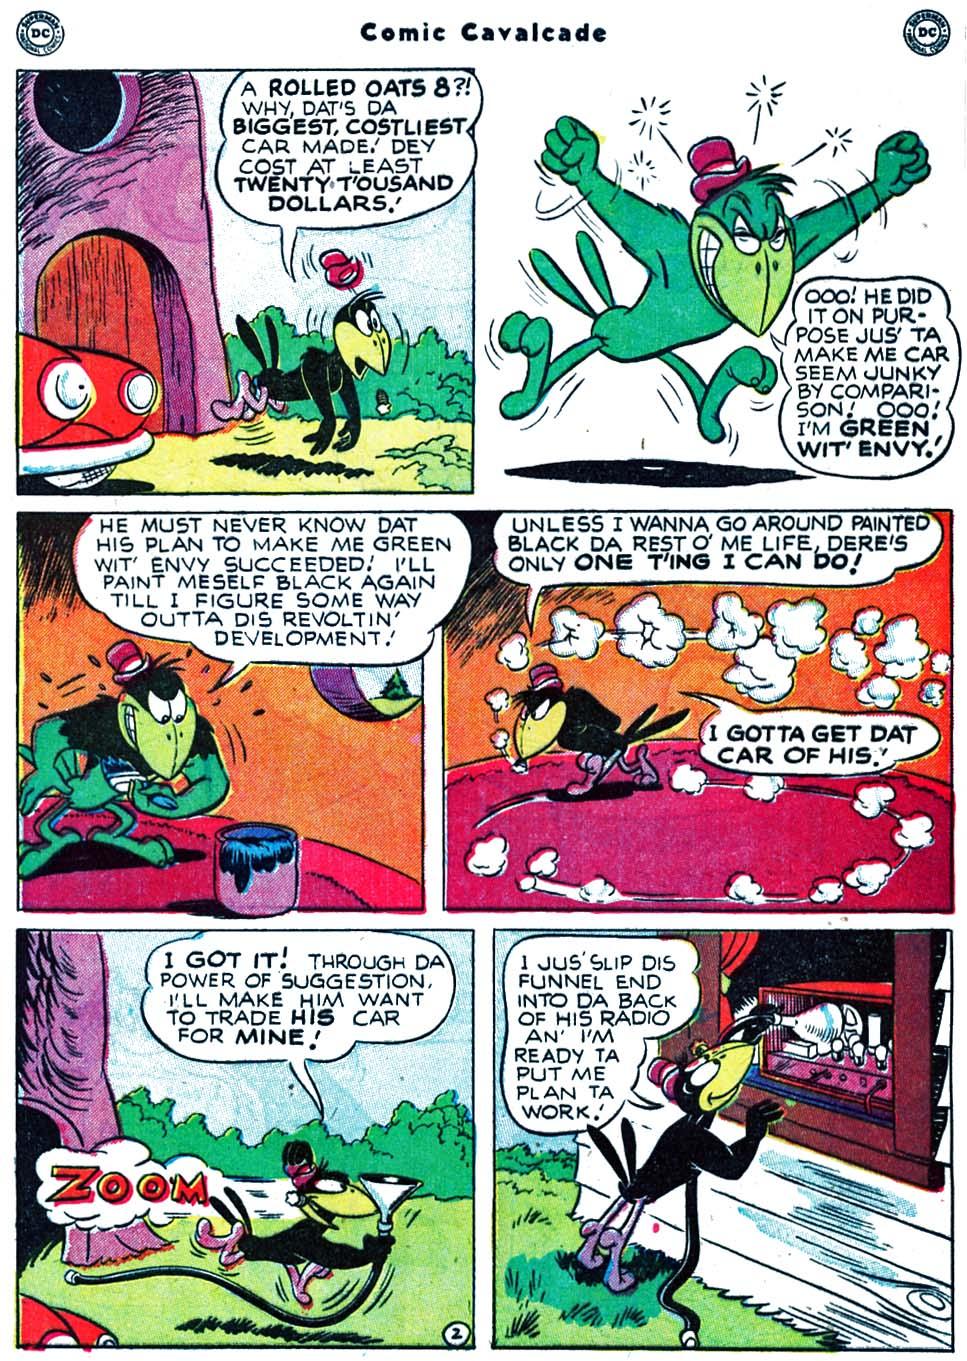 Comic Cavalcade issue 39 - Page 4